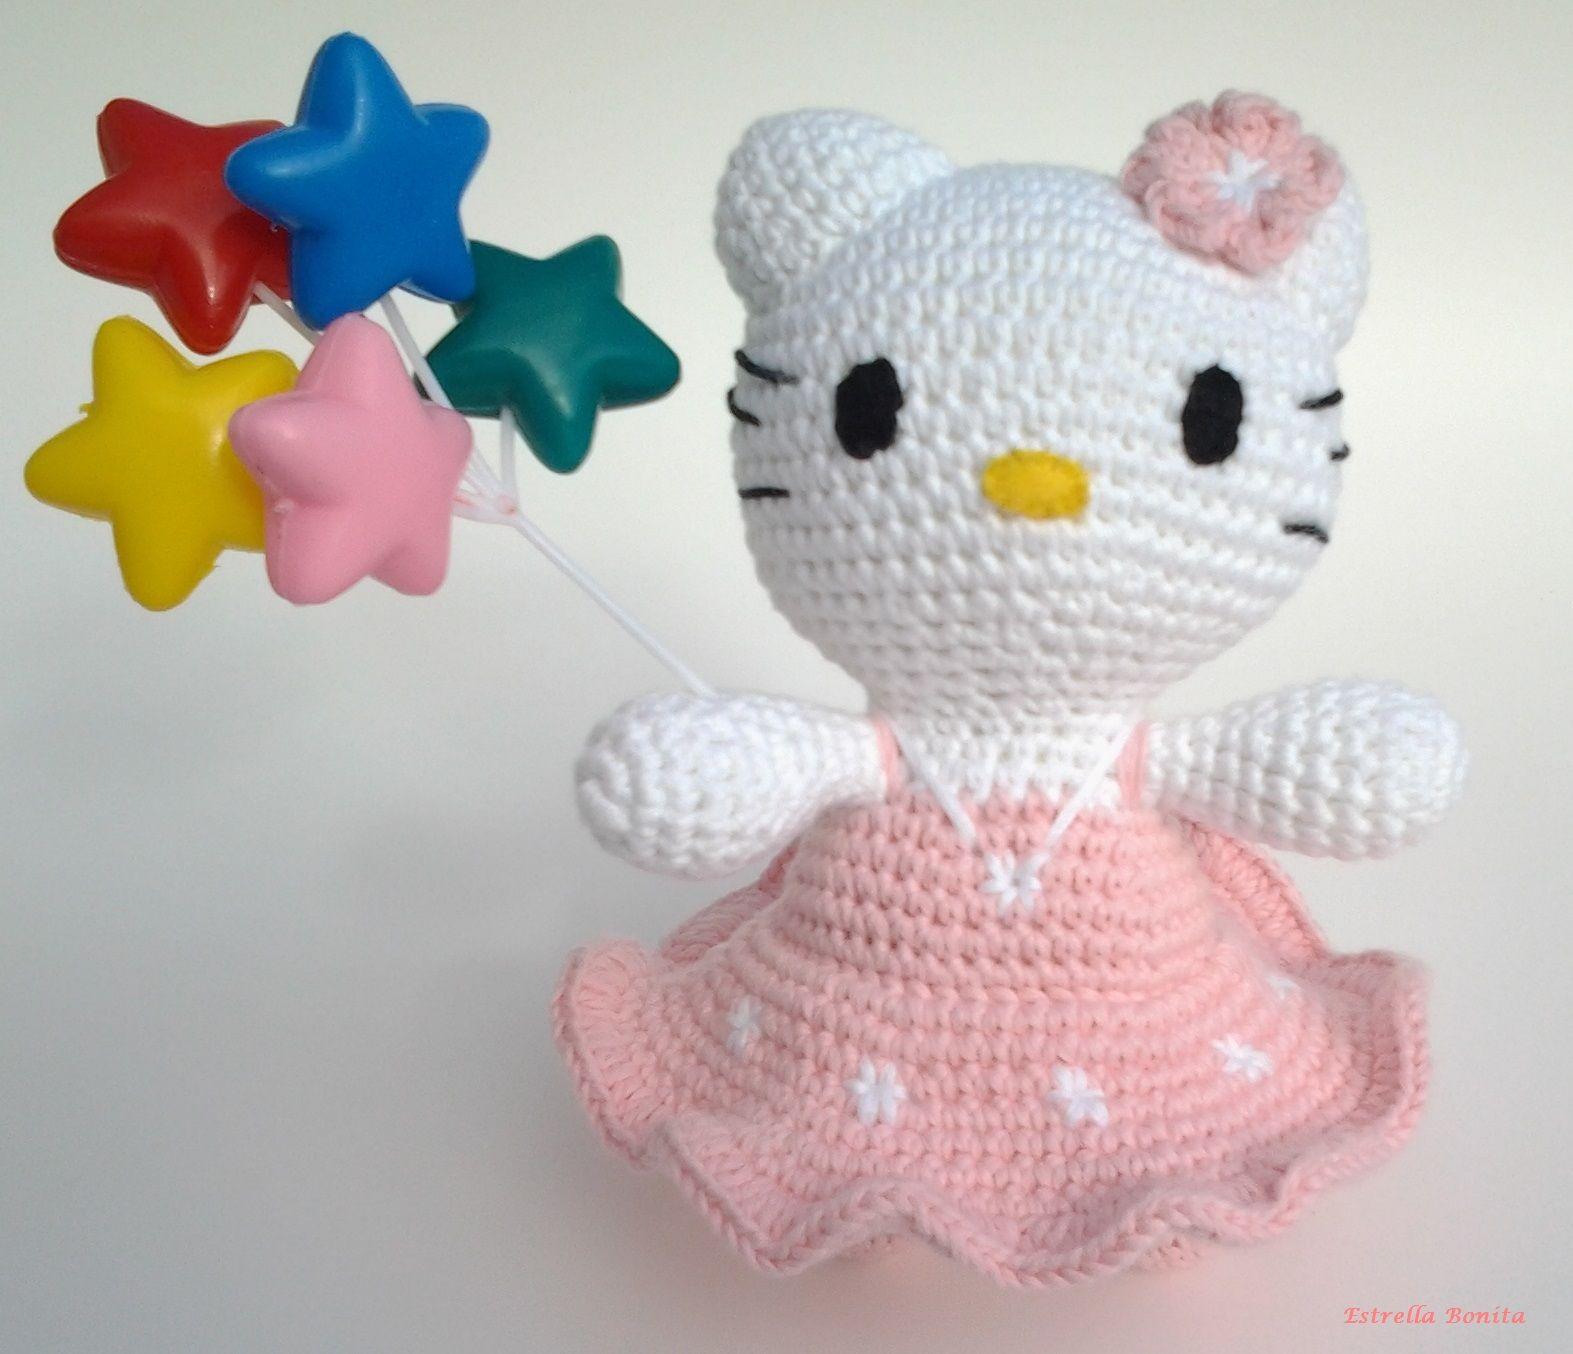 Estrella Bonita: Amigurumi Hello Kitty. Pattern free. http ...